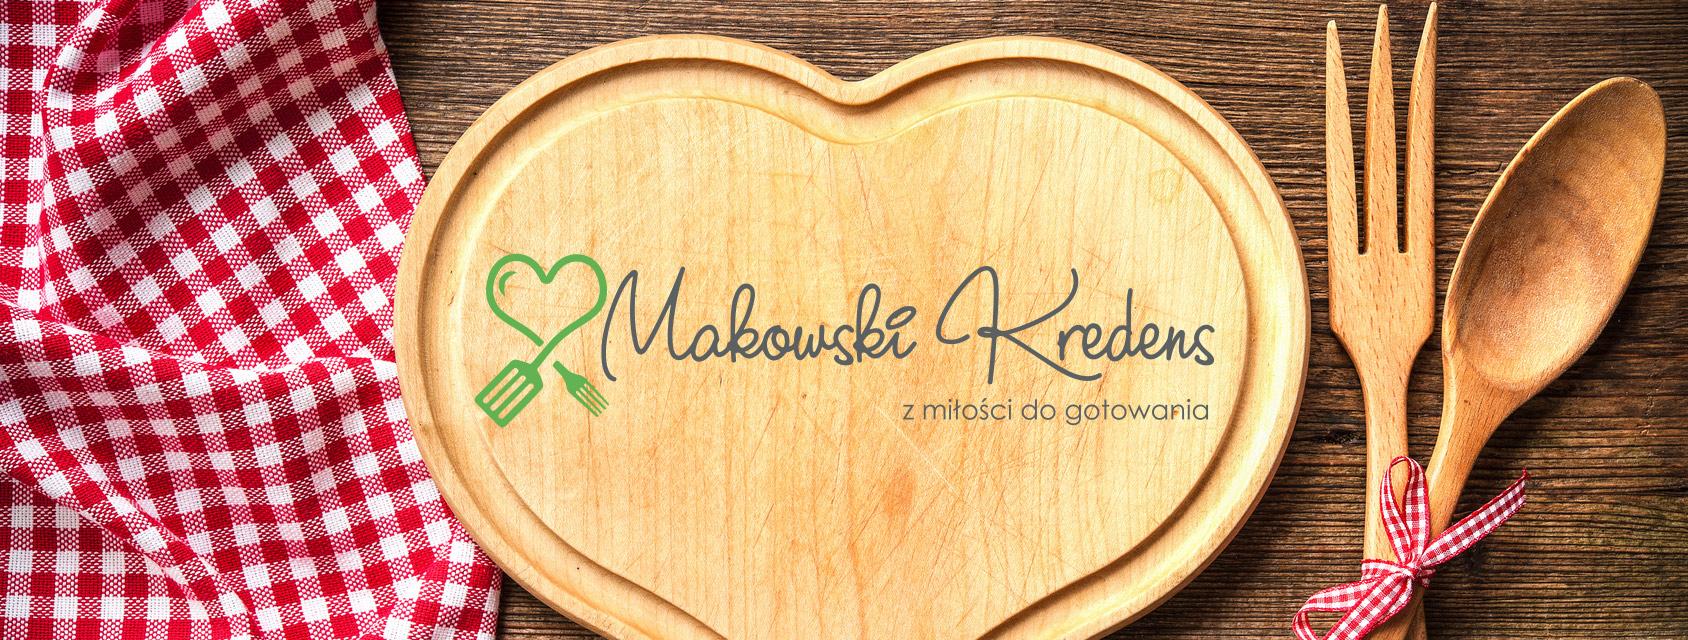 fb_makowski-kredens